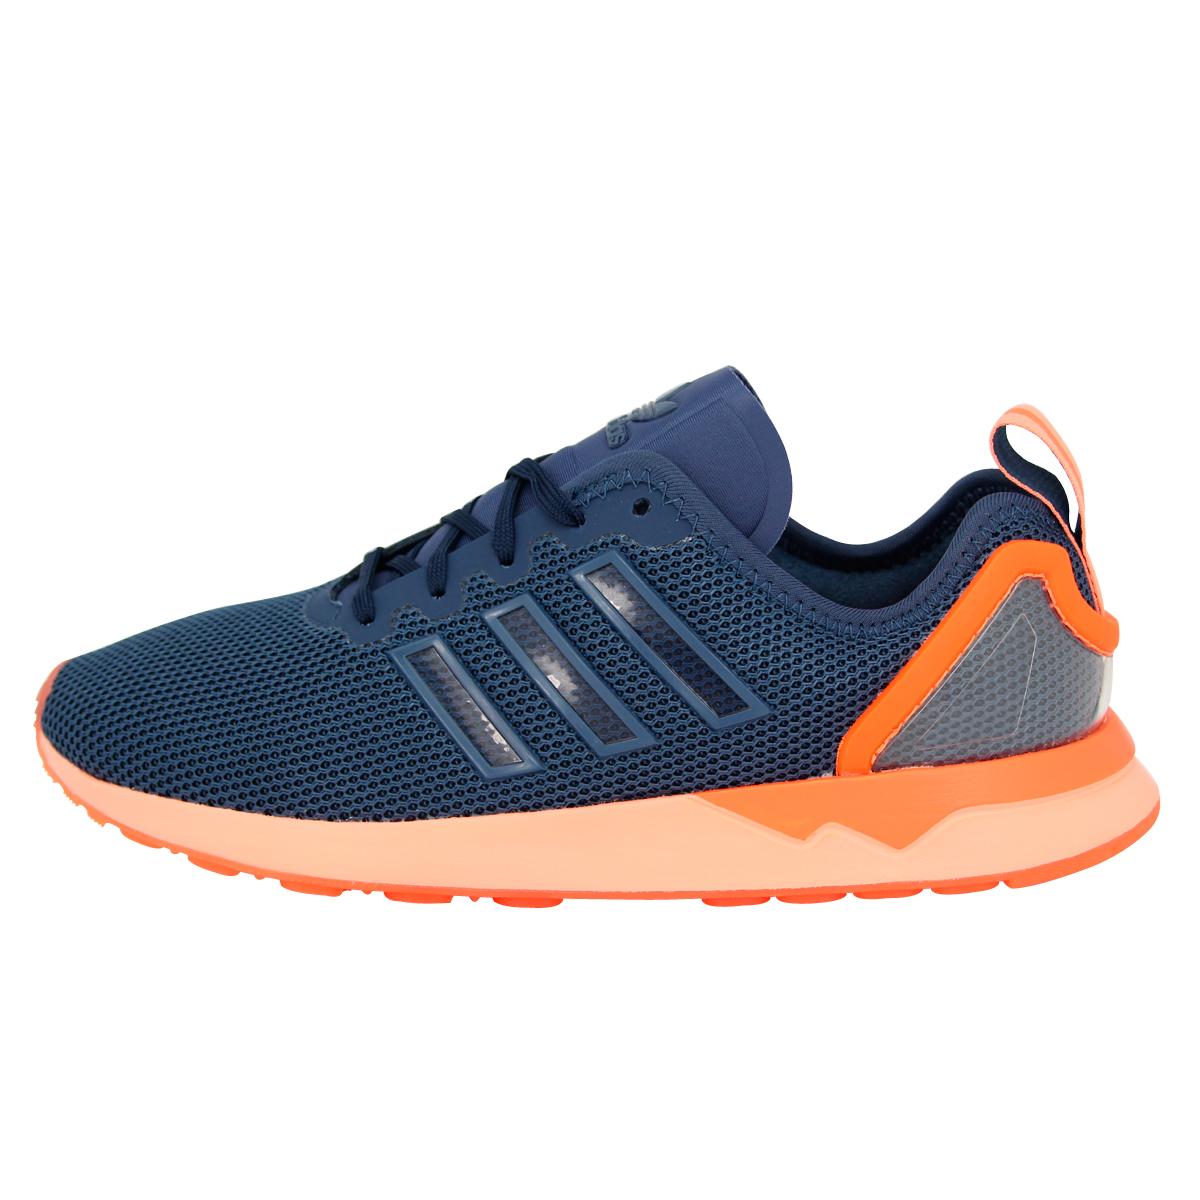 Acheter adidas zx flux bleu orange pas cher